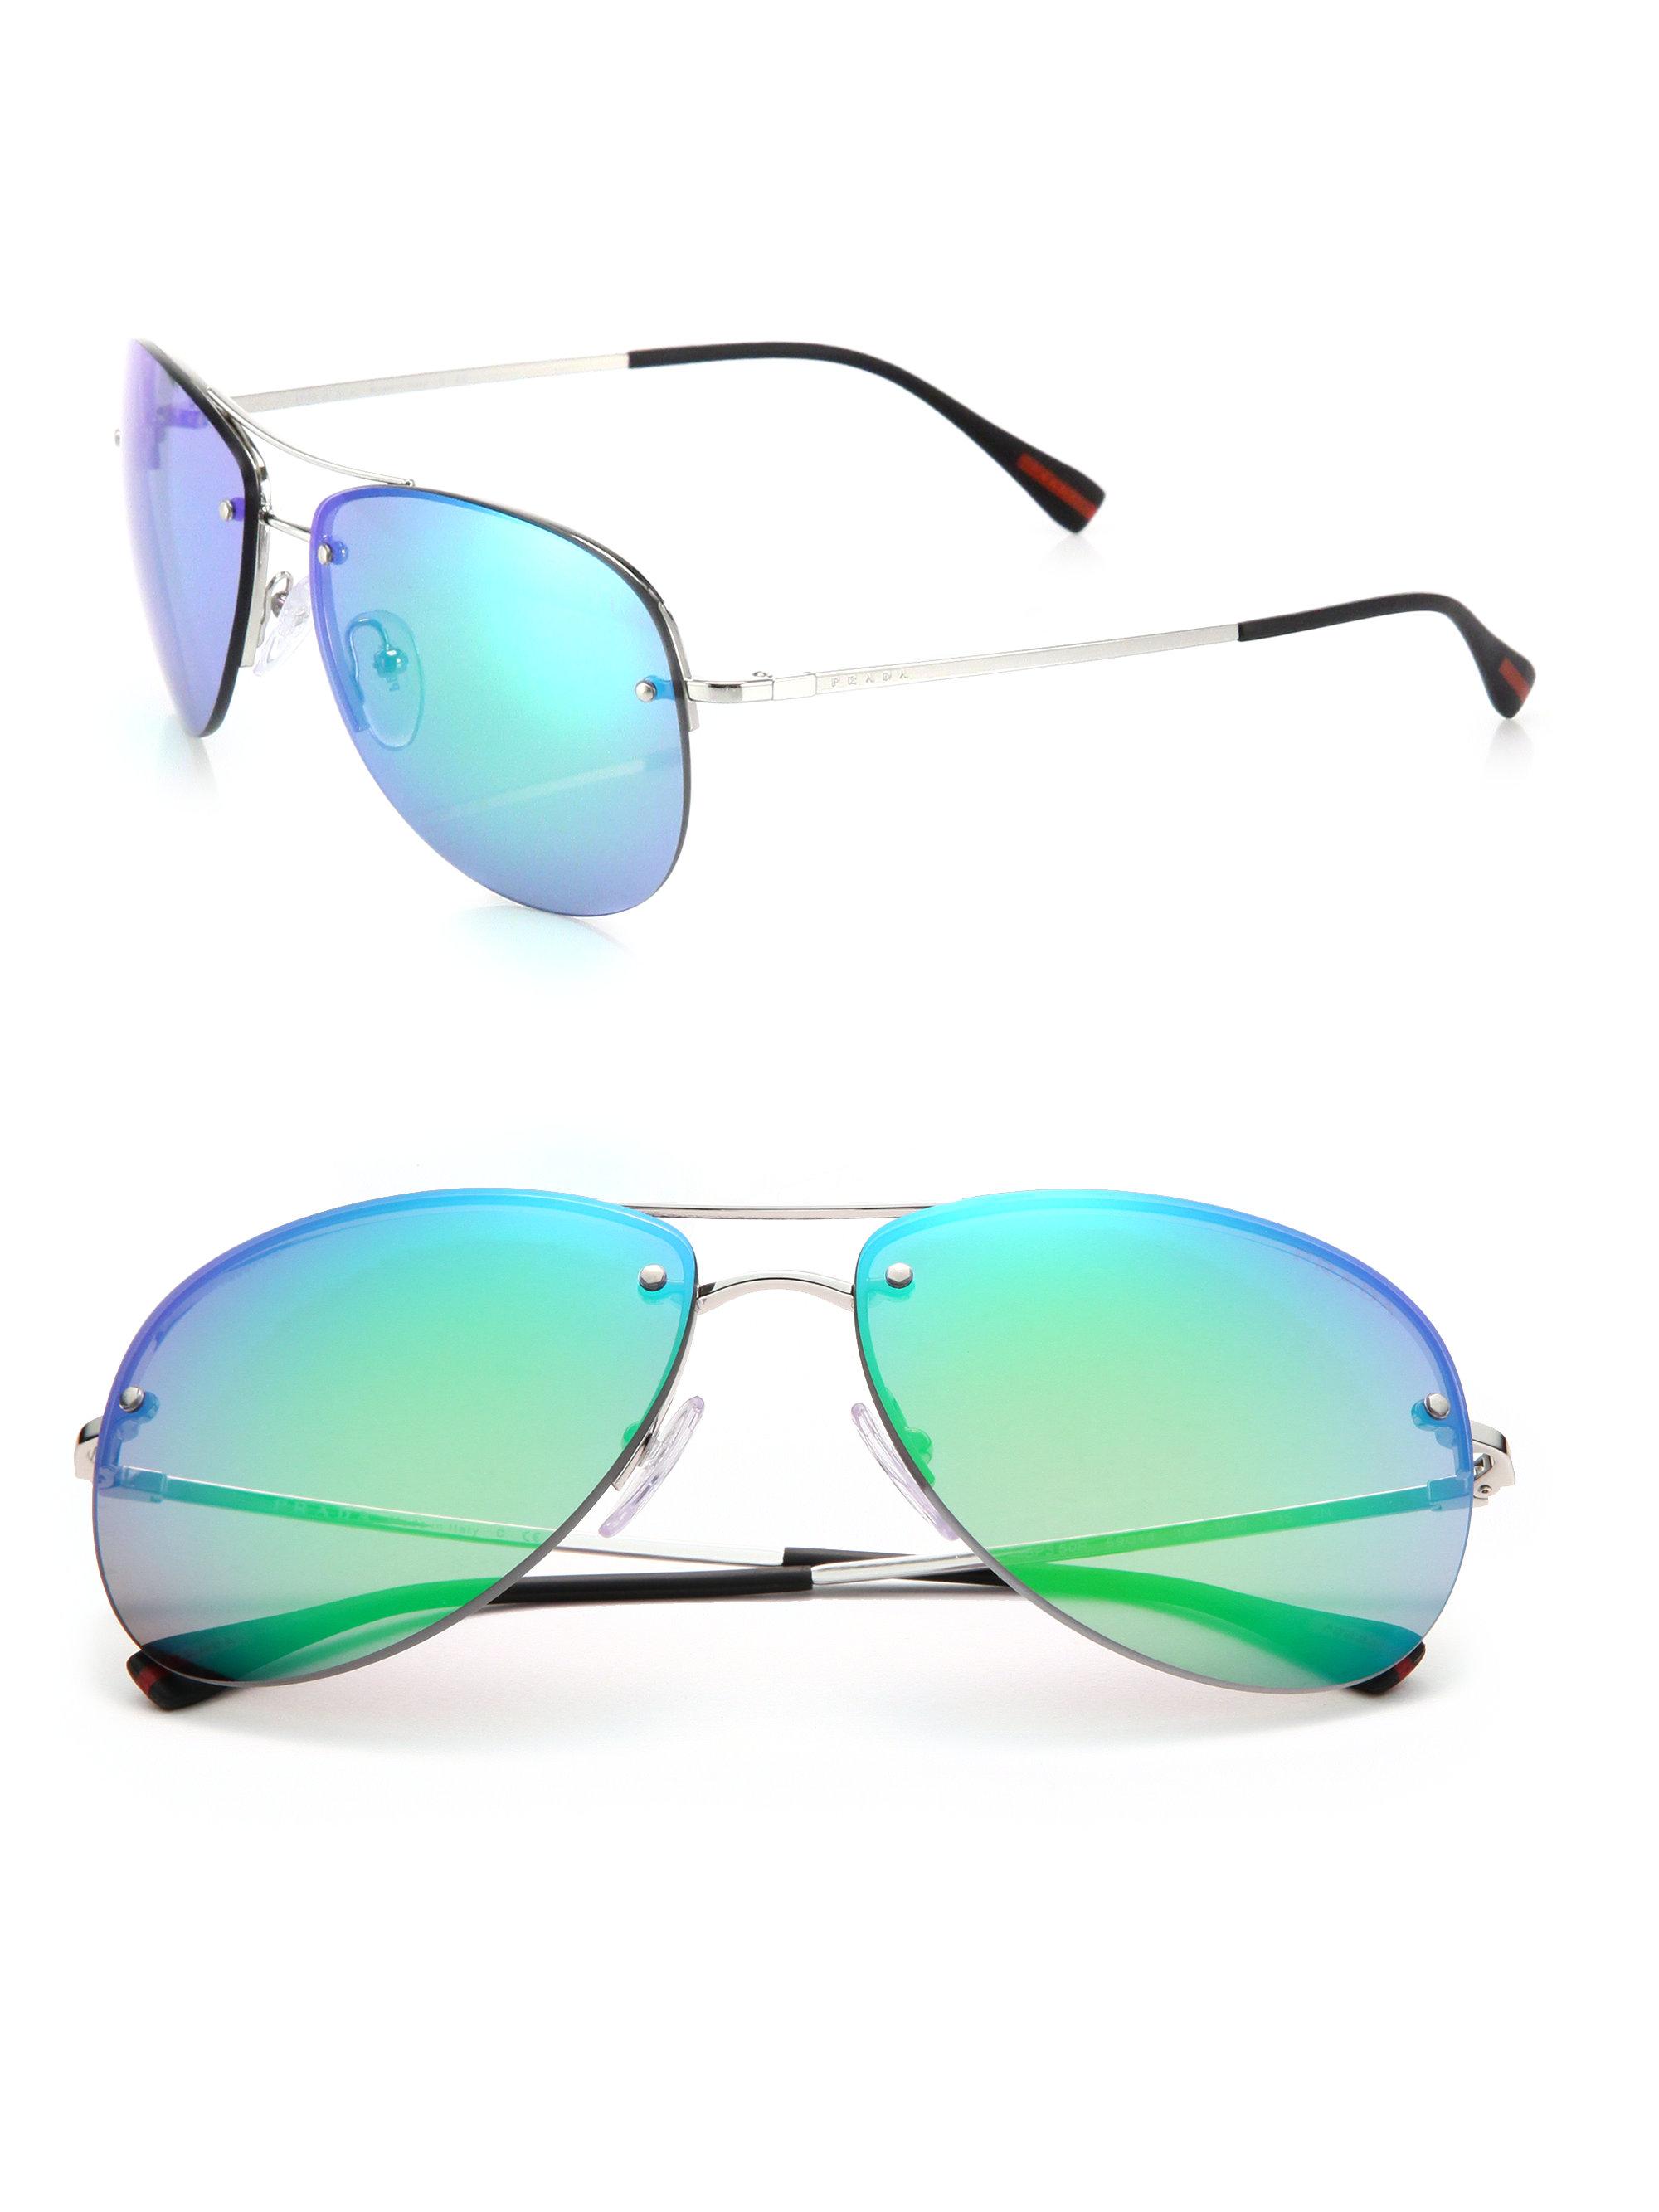 Prada Green Eyeglass Frames : Prada Green Glasses Pictures to pin on Pinterest